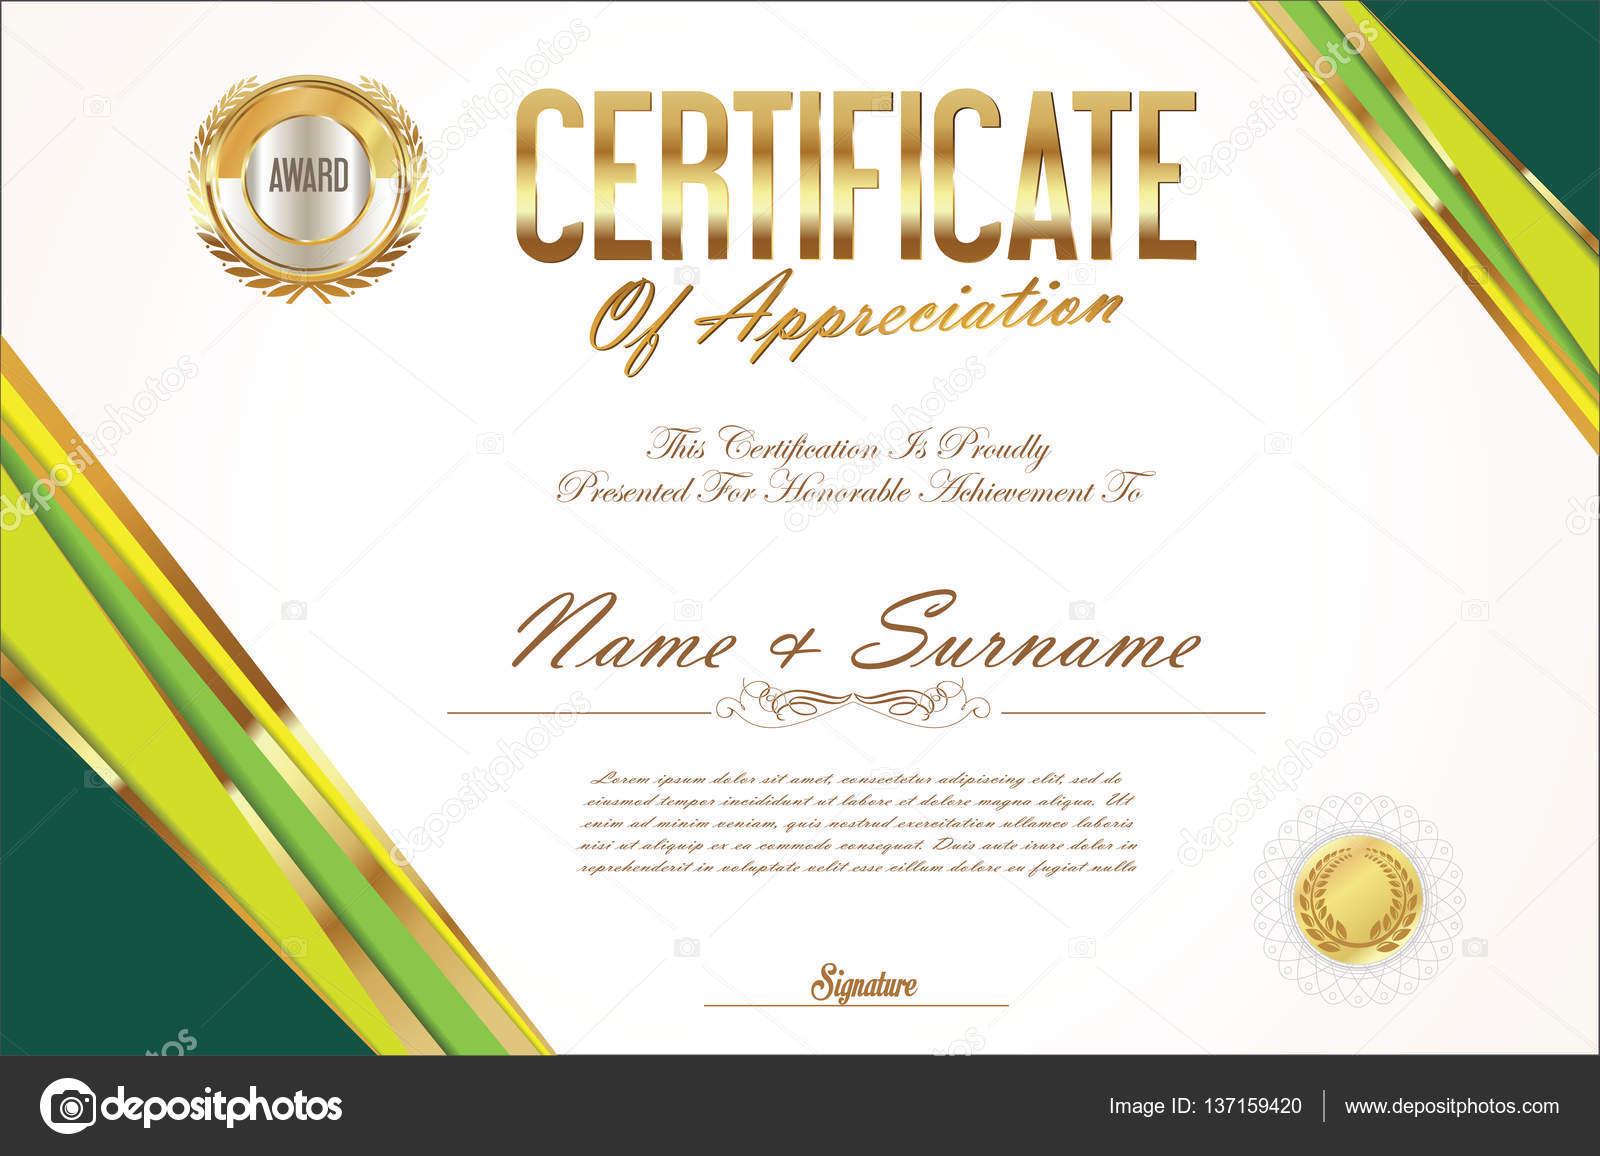 Zertifikat-Vorlage-retro-design — Stockvektor © totallyout #137159420